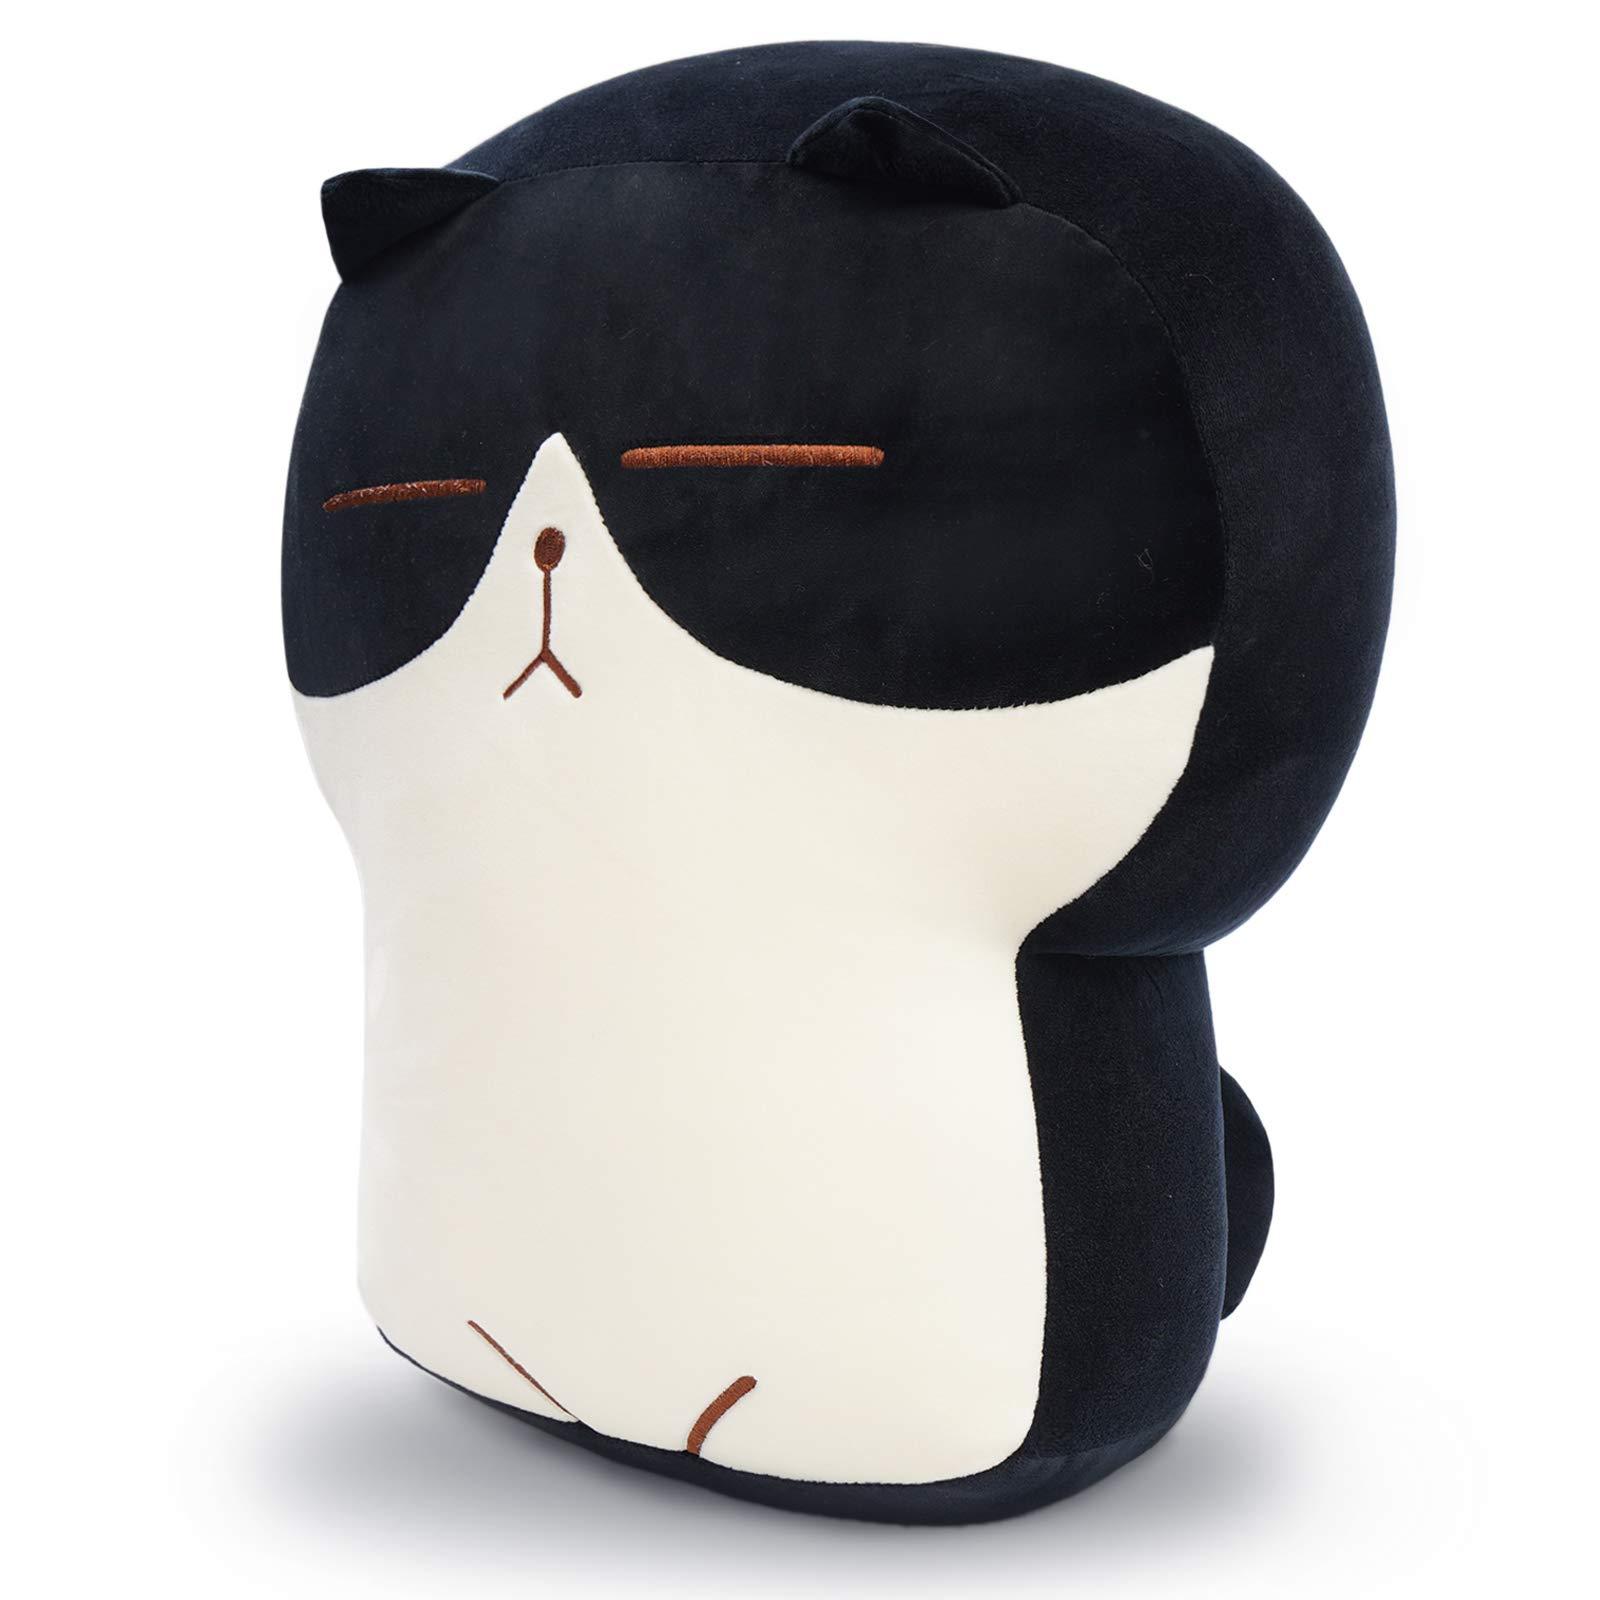 dentrun stuffed cat plush pillow big